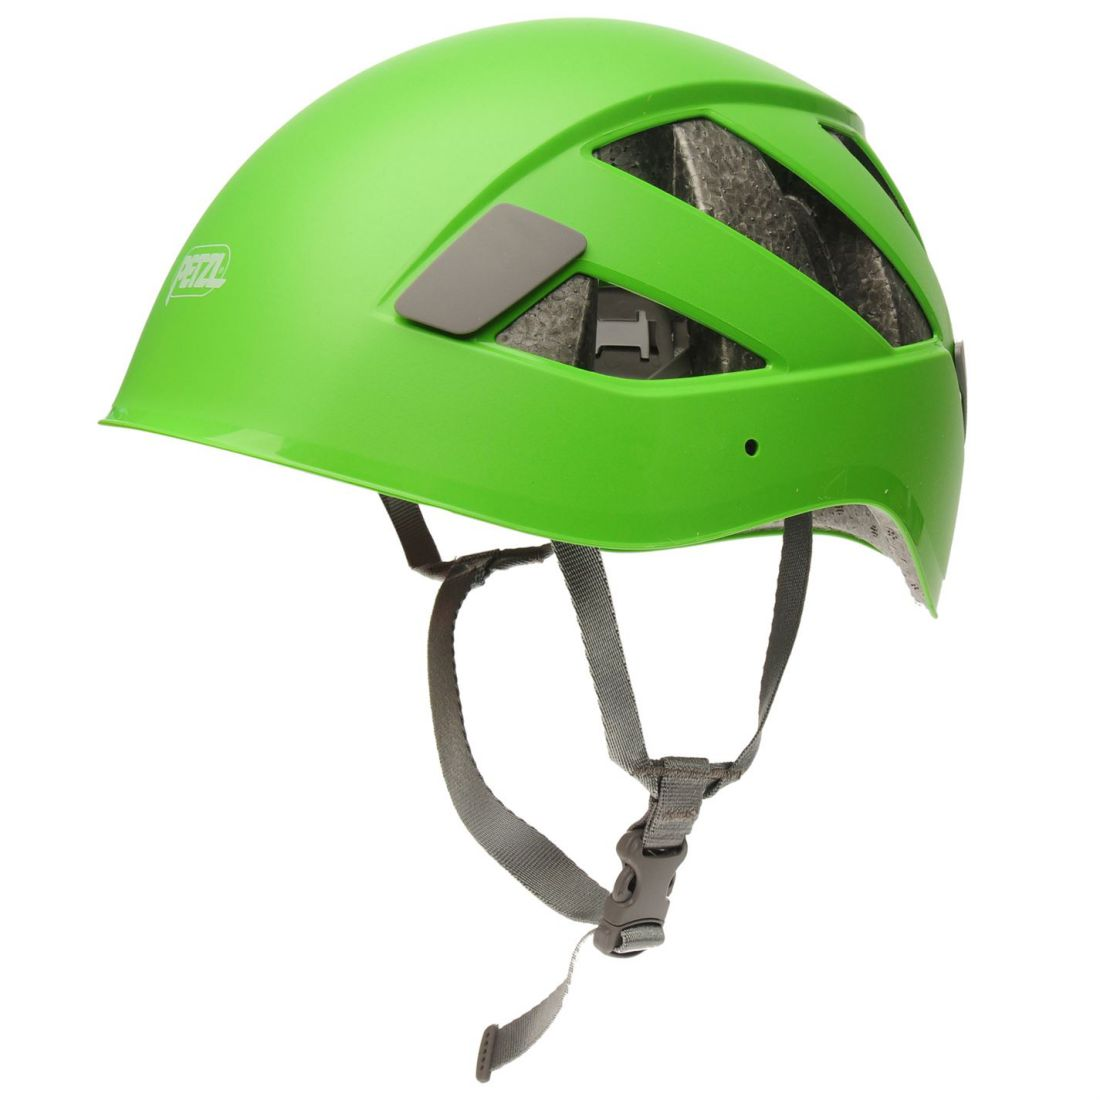 Petzl Boreo Climbing Helmet Adults Unisex Clip Fastening Compact